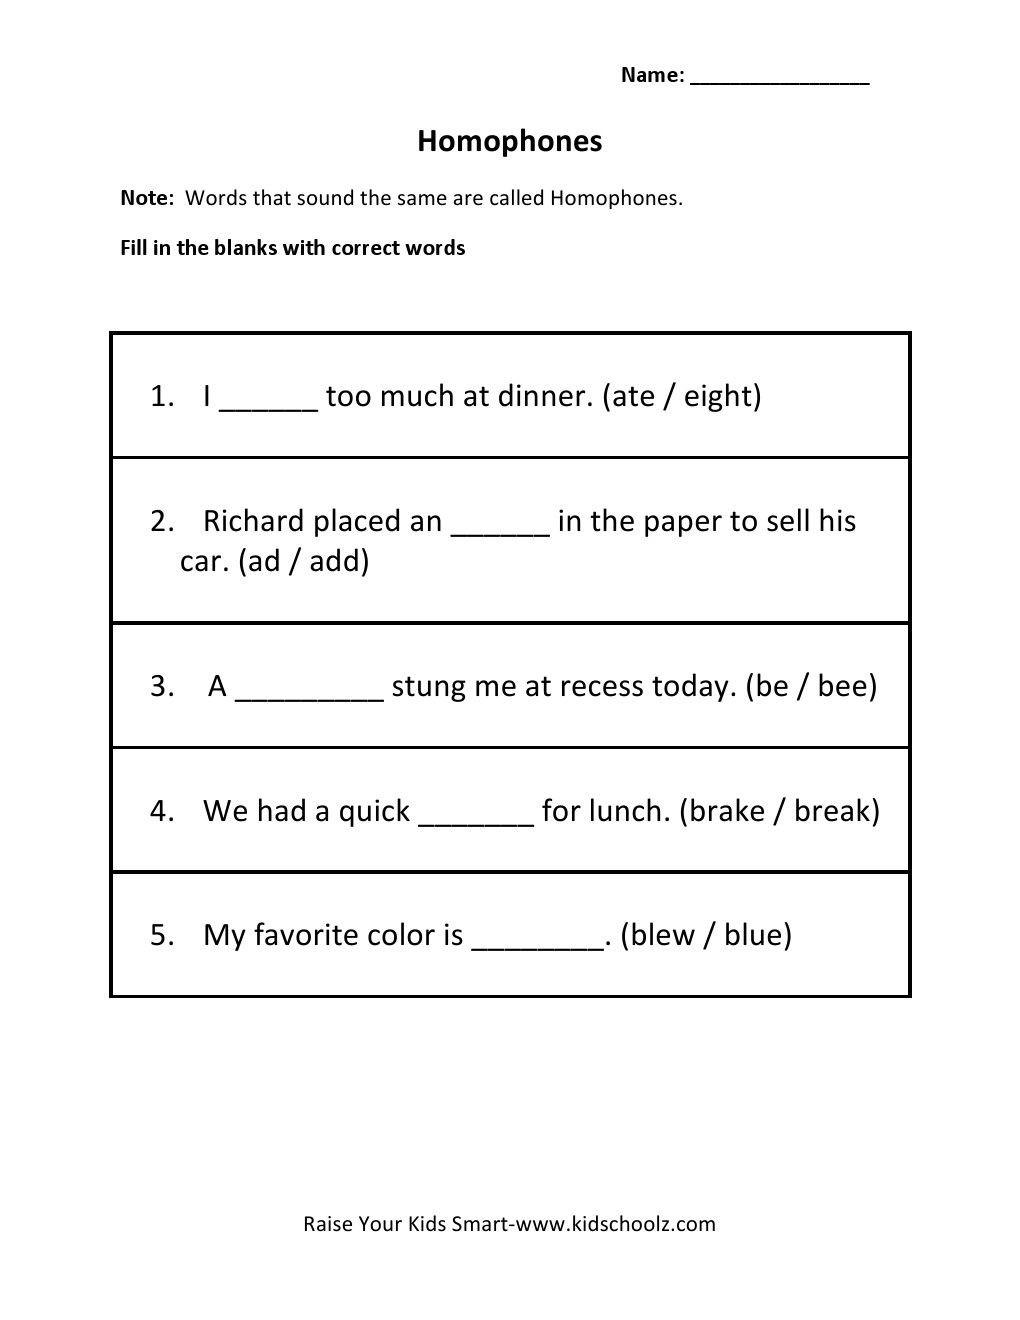 Homophones Worksheet 5th Grade Homophones Worksheets for Grade 5